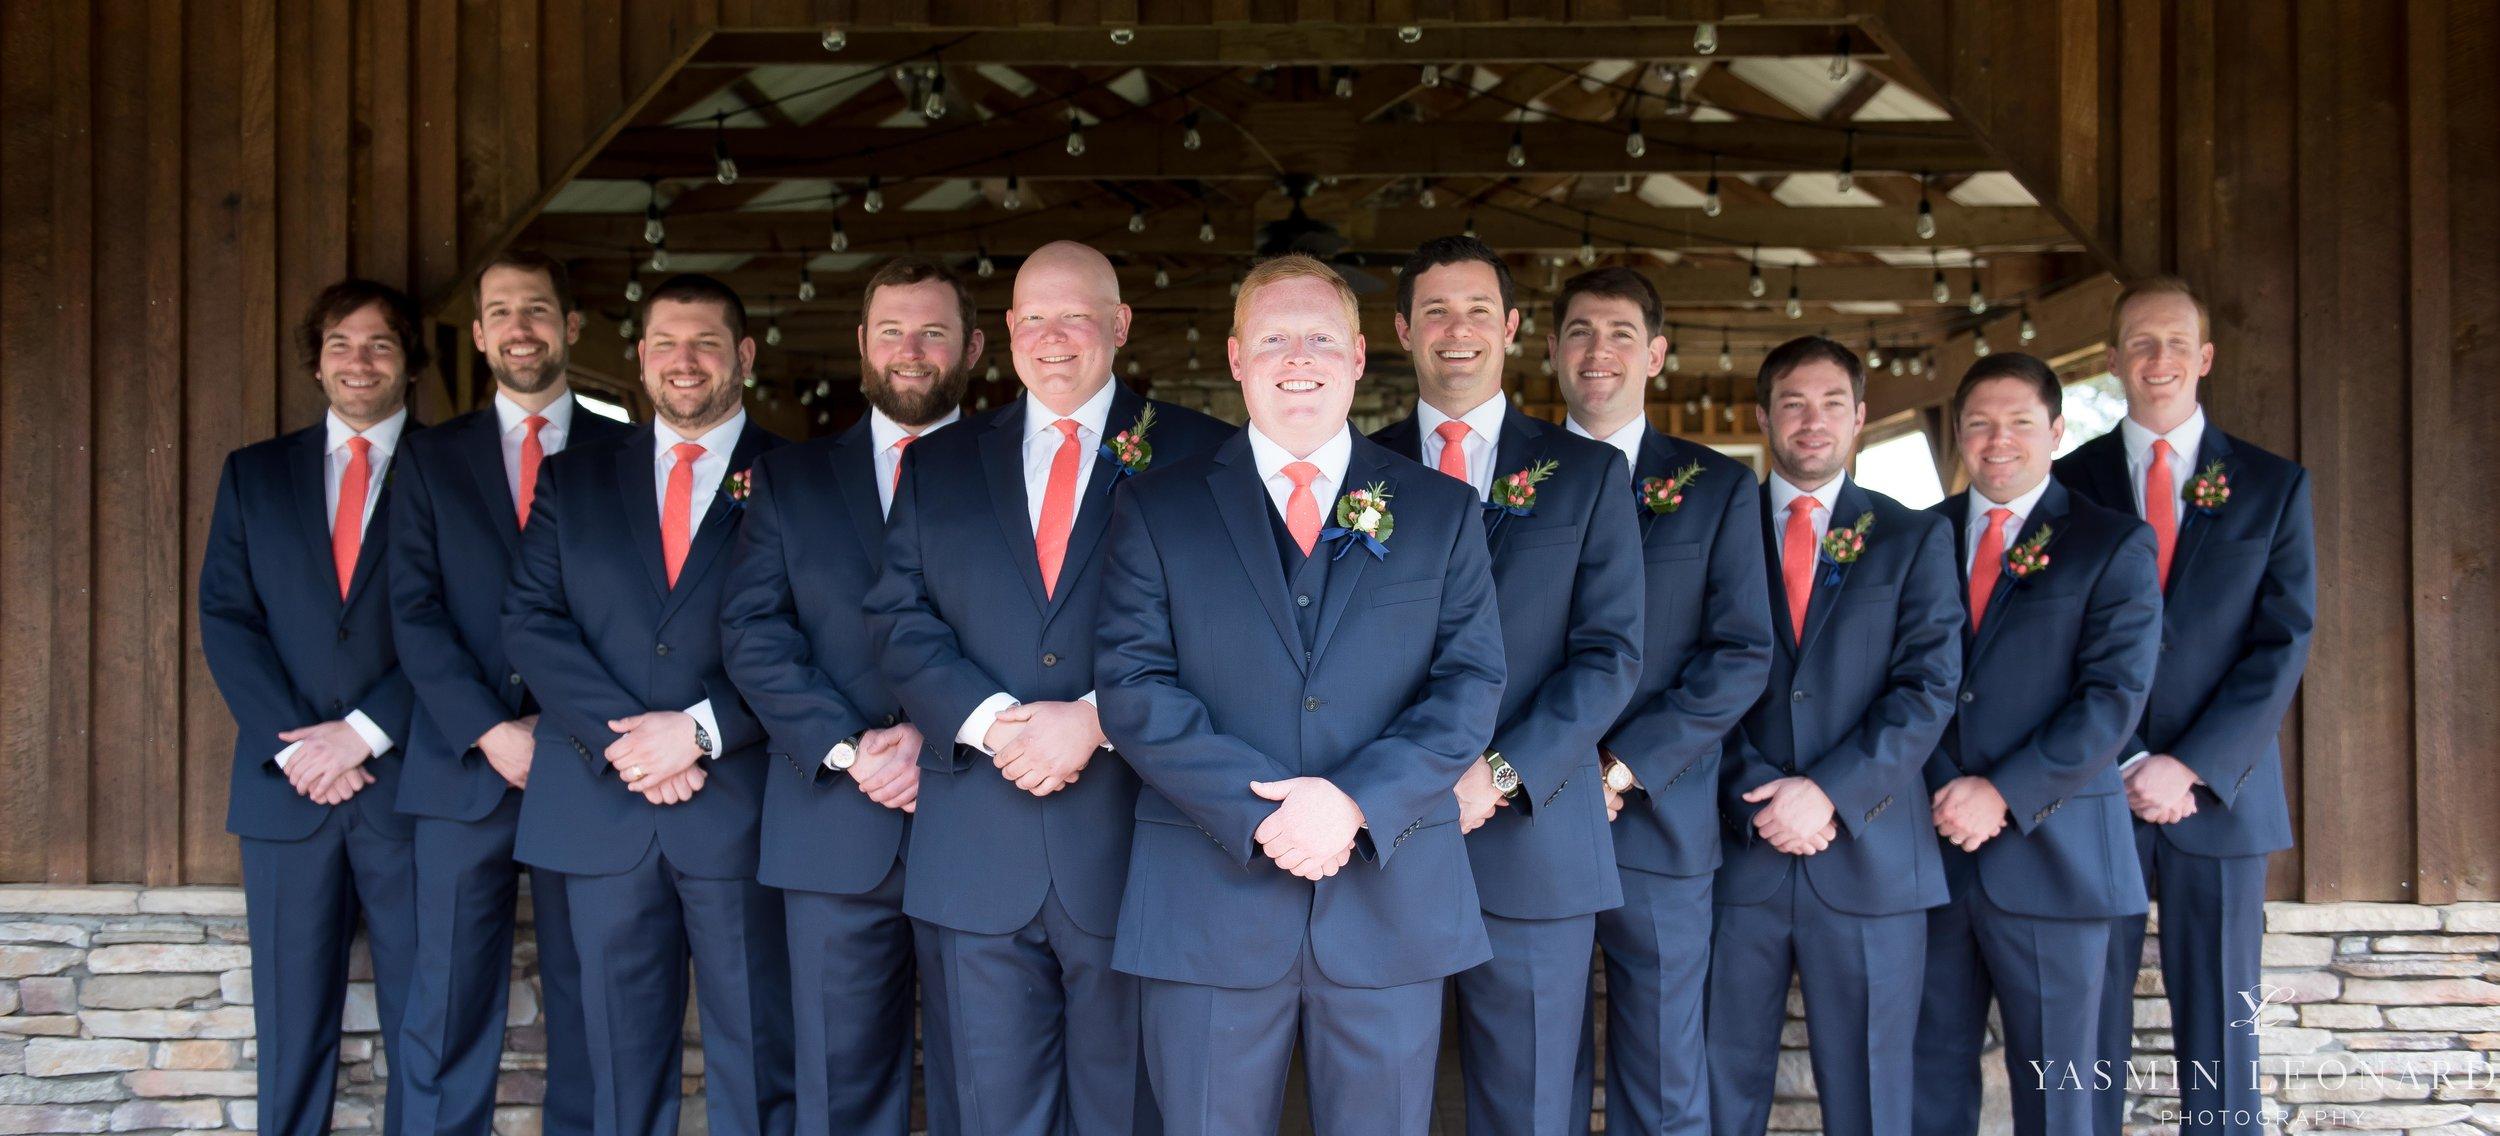 Adaumont Farm - Adaumont Farm Weddings - Trinity Weddings - NC Weddings - Yasmin Leonard Photography-14.jpg